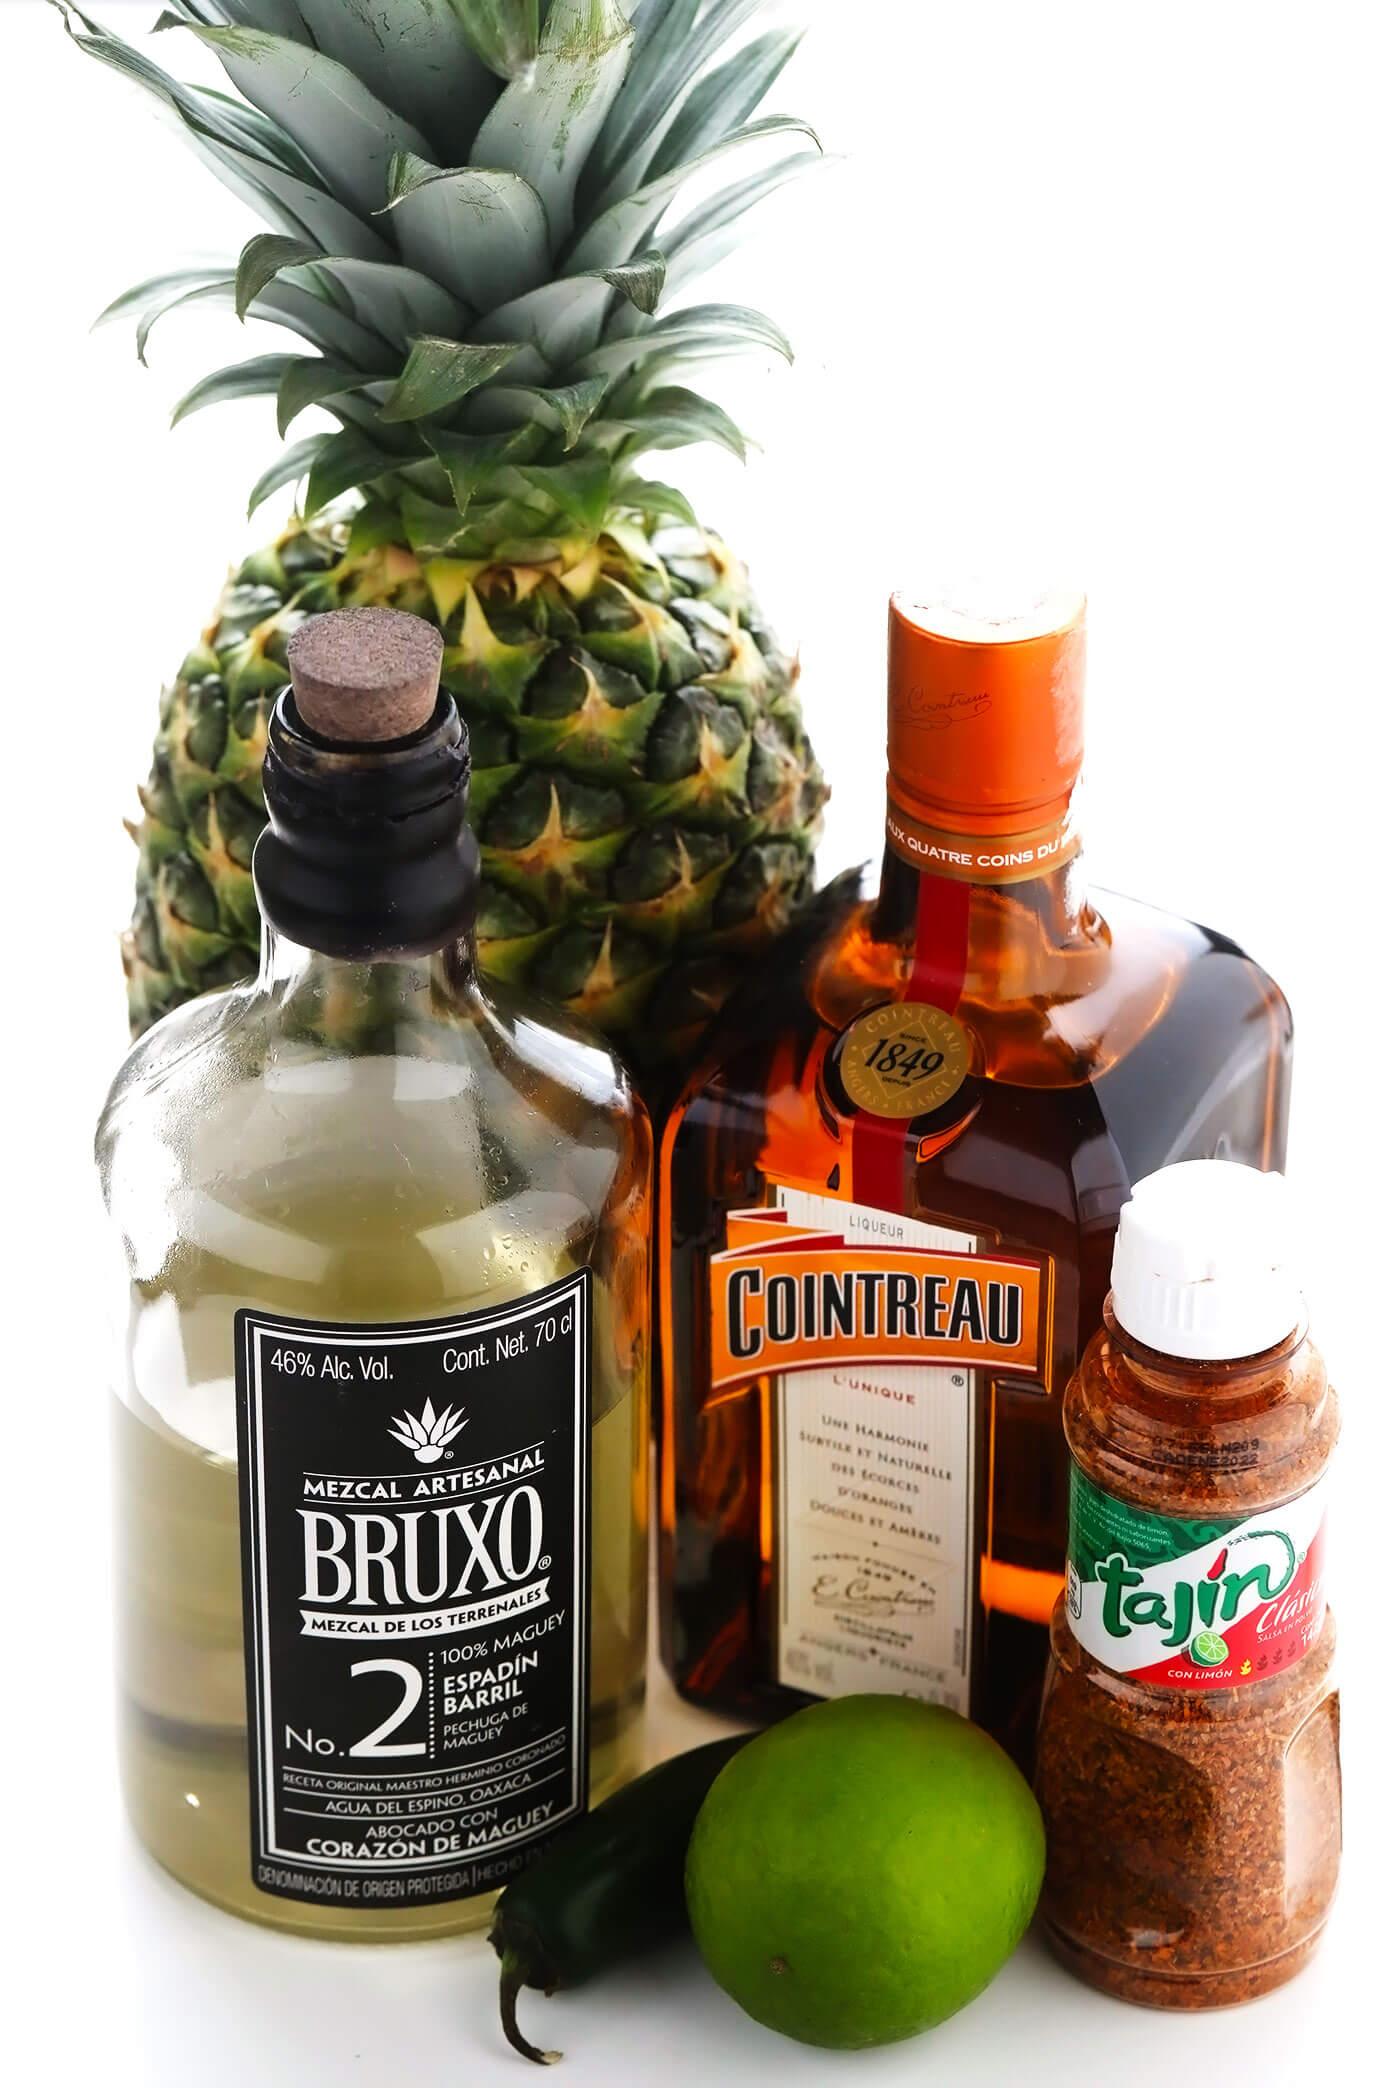 Spicy Pineapple Margarita Ingredients -- Pineapple, Mezcal, Cointreau, Lime, Jalapeño and Tajin